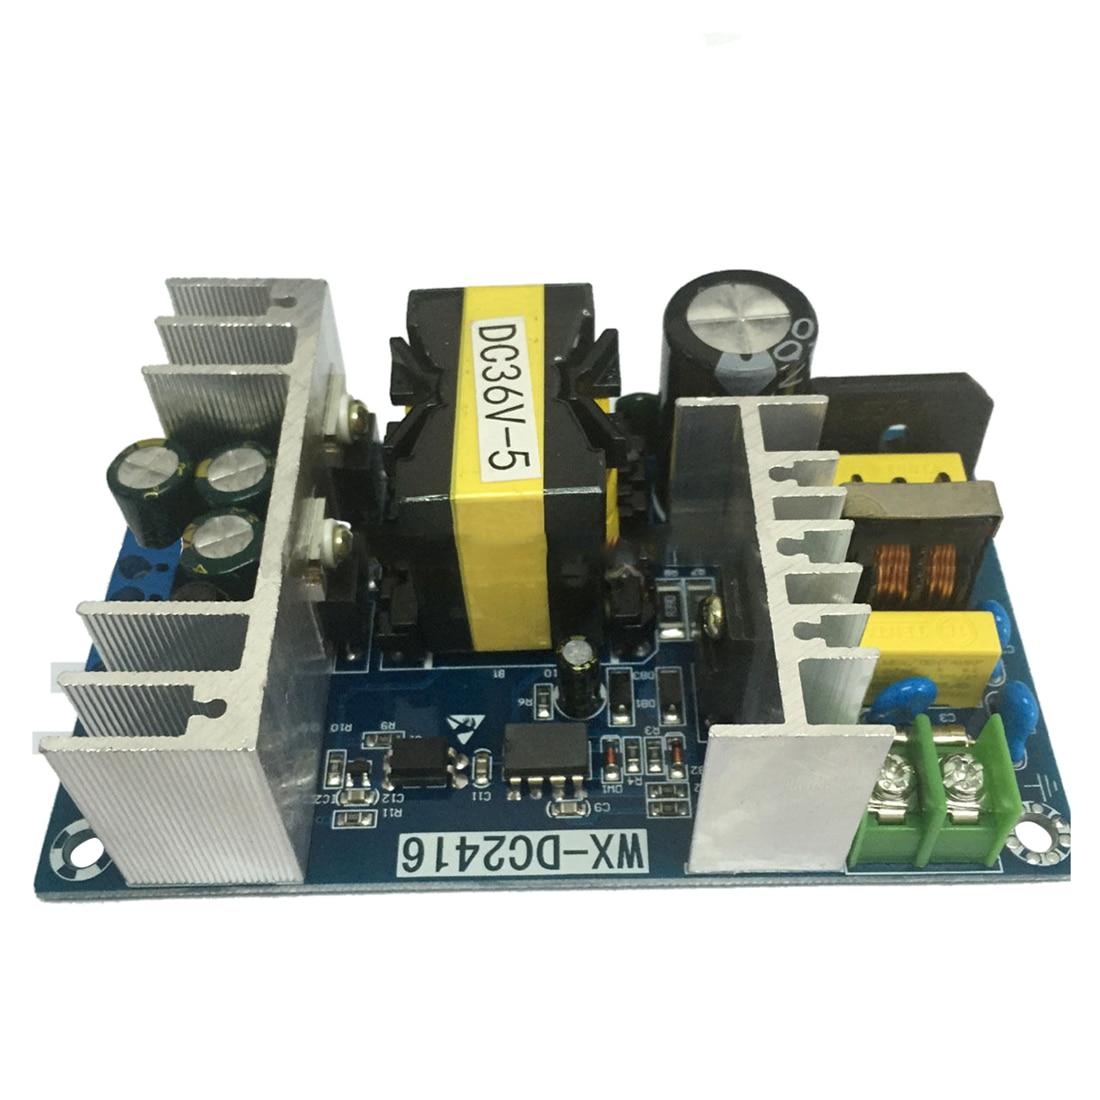 AC-DC Inverter Module 110V 220V 100-265V to 36V 5A Adapter Switching Power Supply